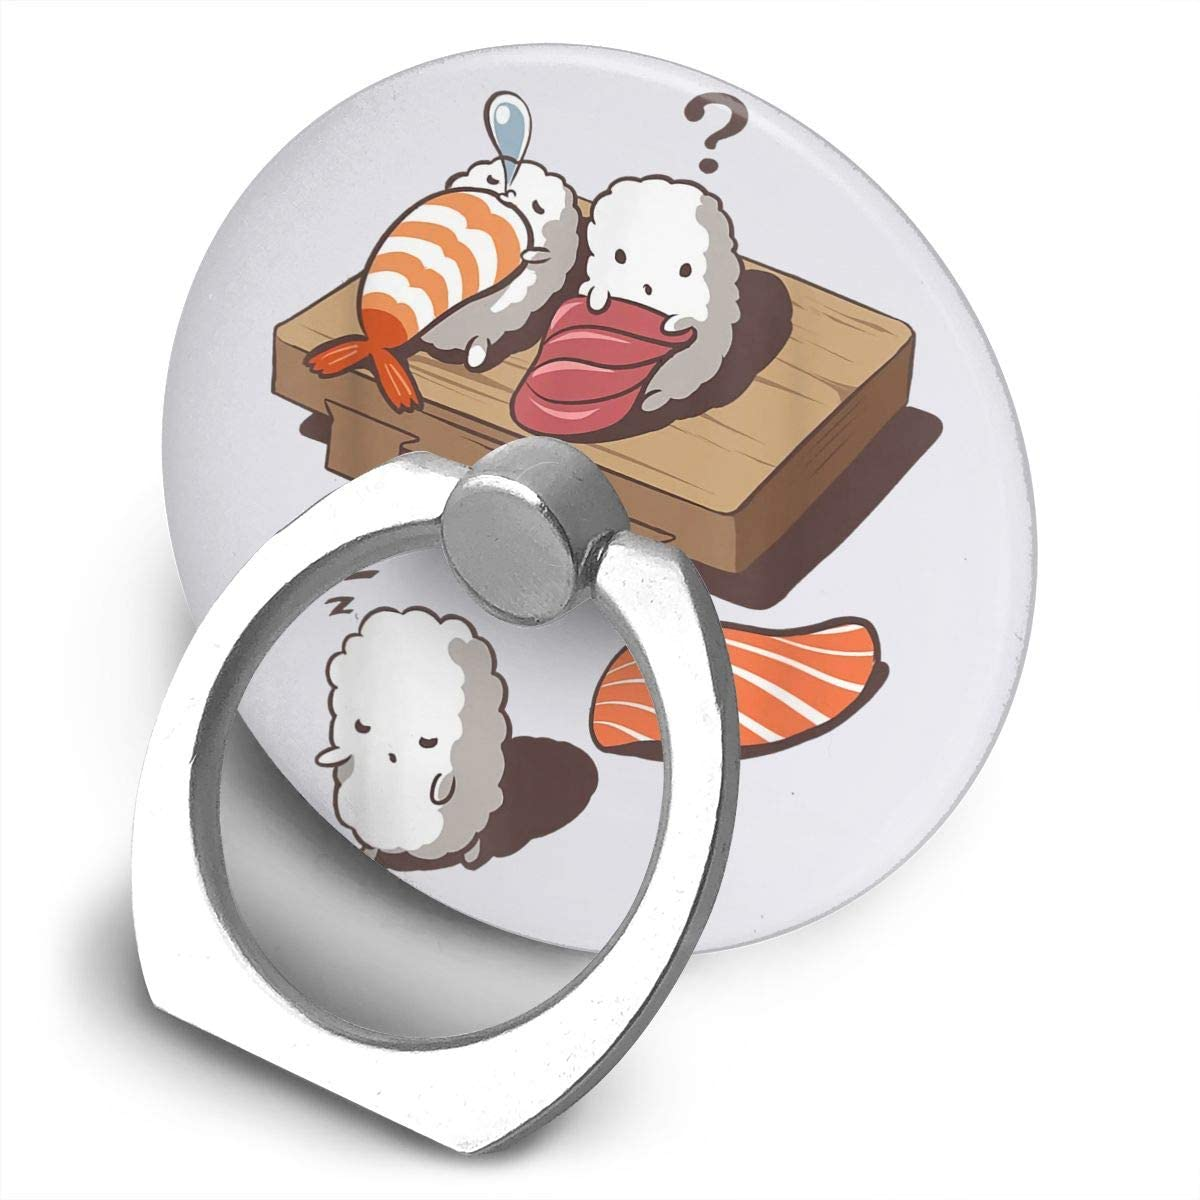 Tymeihao Funny Sleep Walking Sushi Alloy Mobile Phone Ring Bracket,360 Degree Rotating Ring Stand Grip Mounts